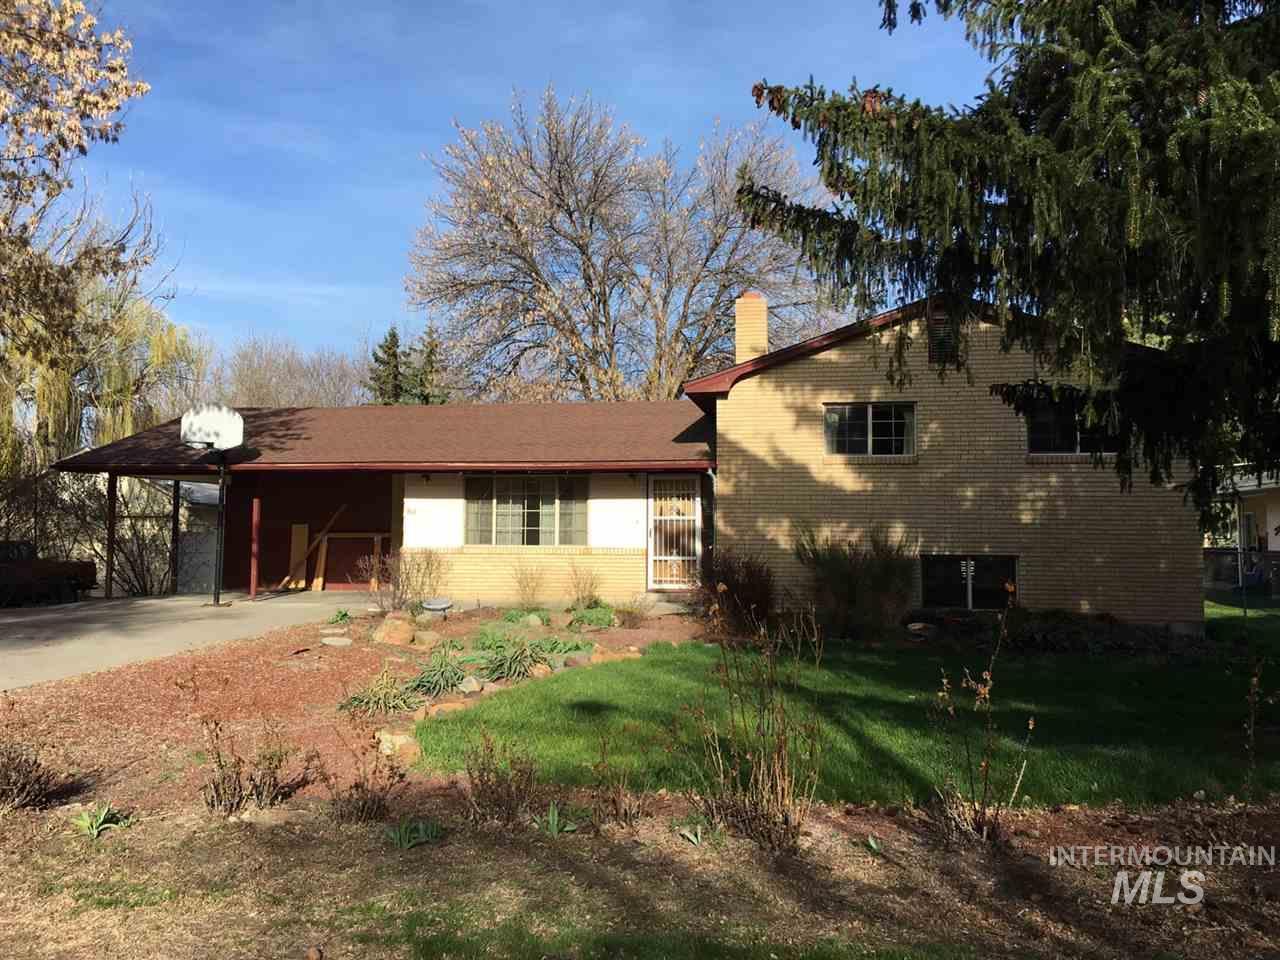 Single Family Home for Sale at 860 Oregon Gooding, Idaho 83330